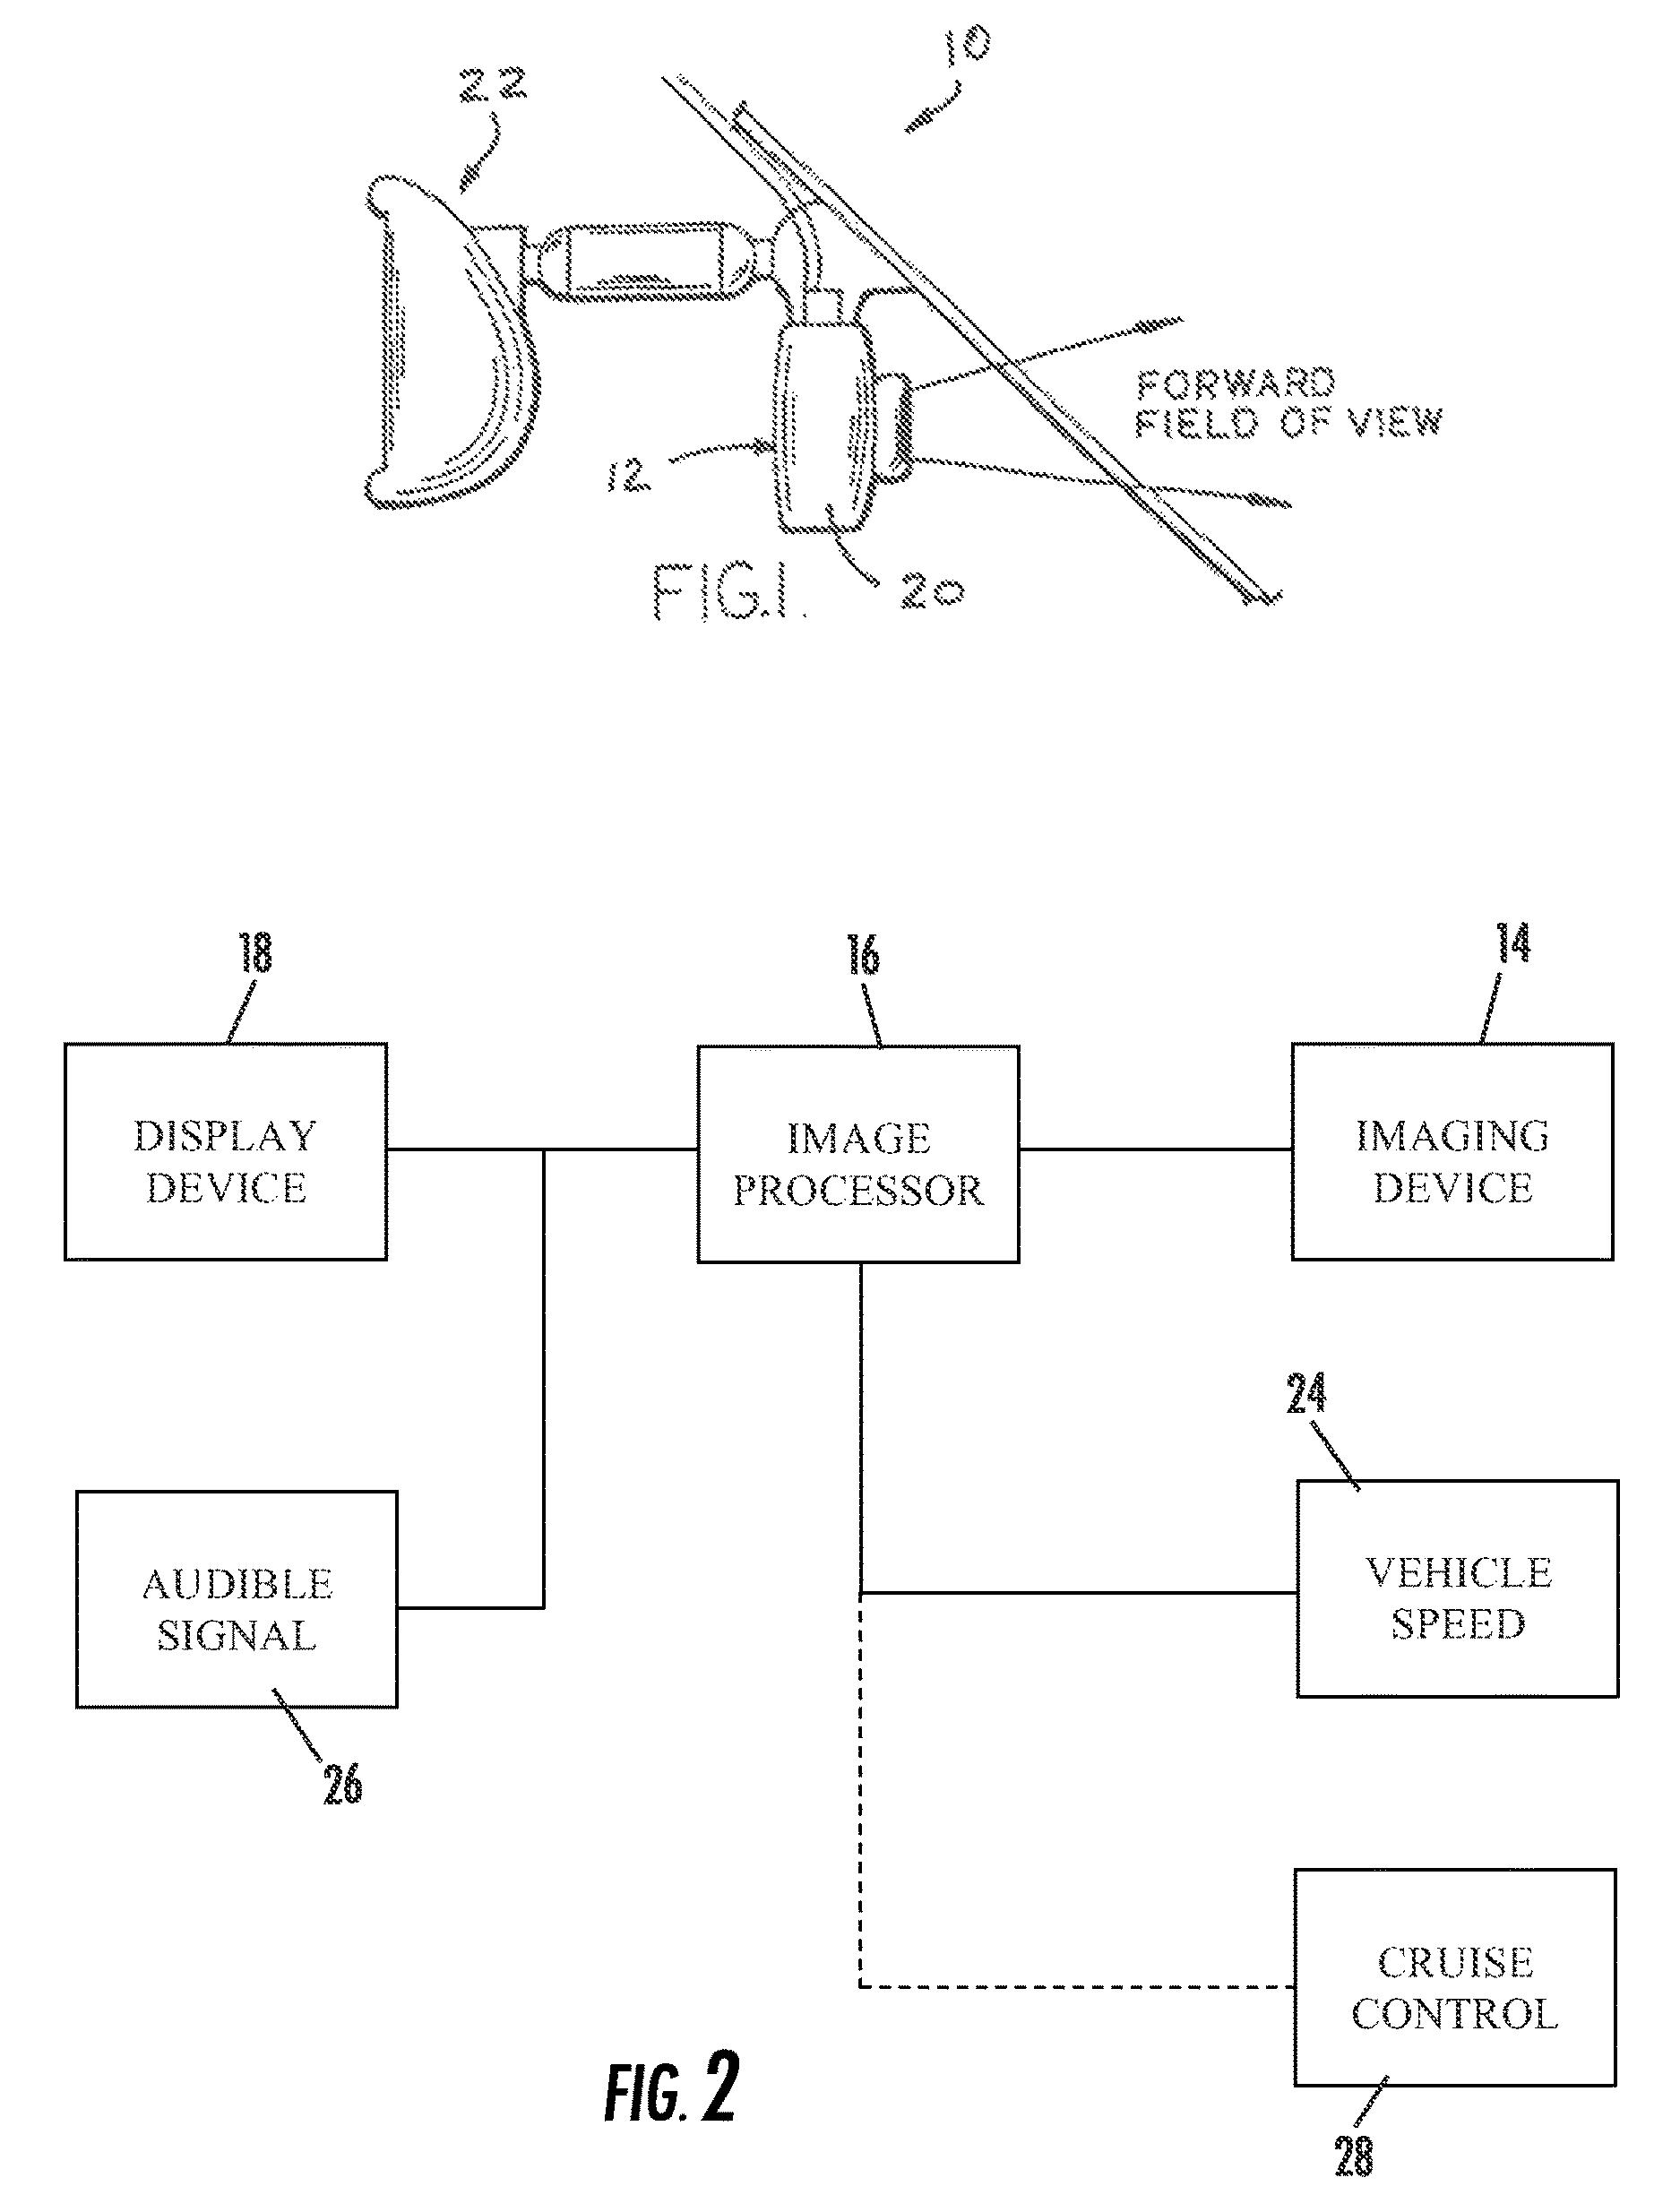 Patent US 9,736,435 B2